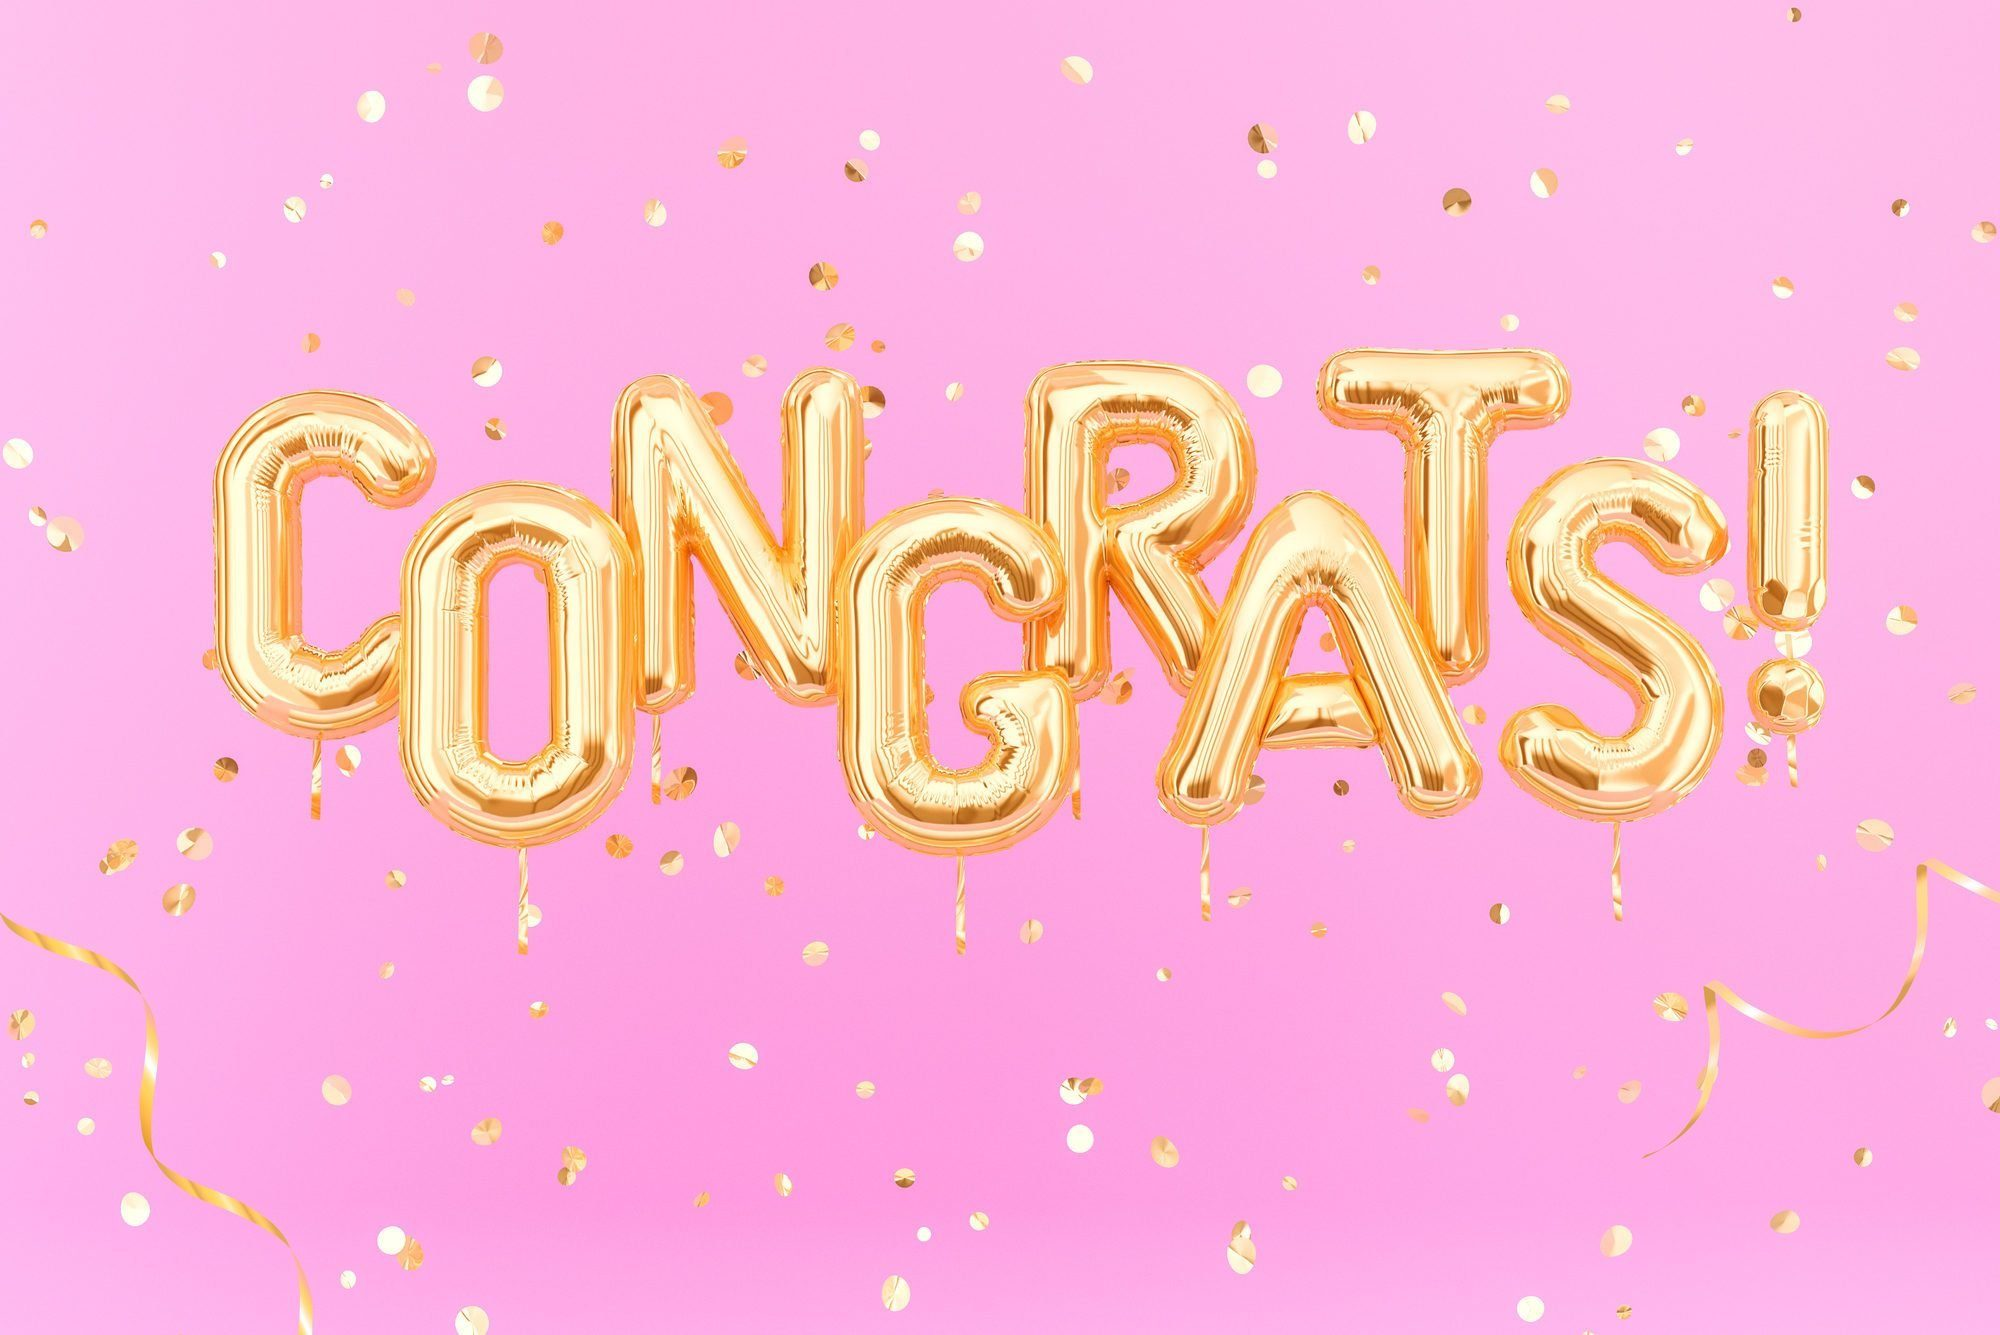 Congrats text with golden confetti. Congratulations banner